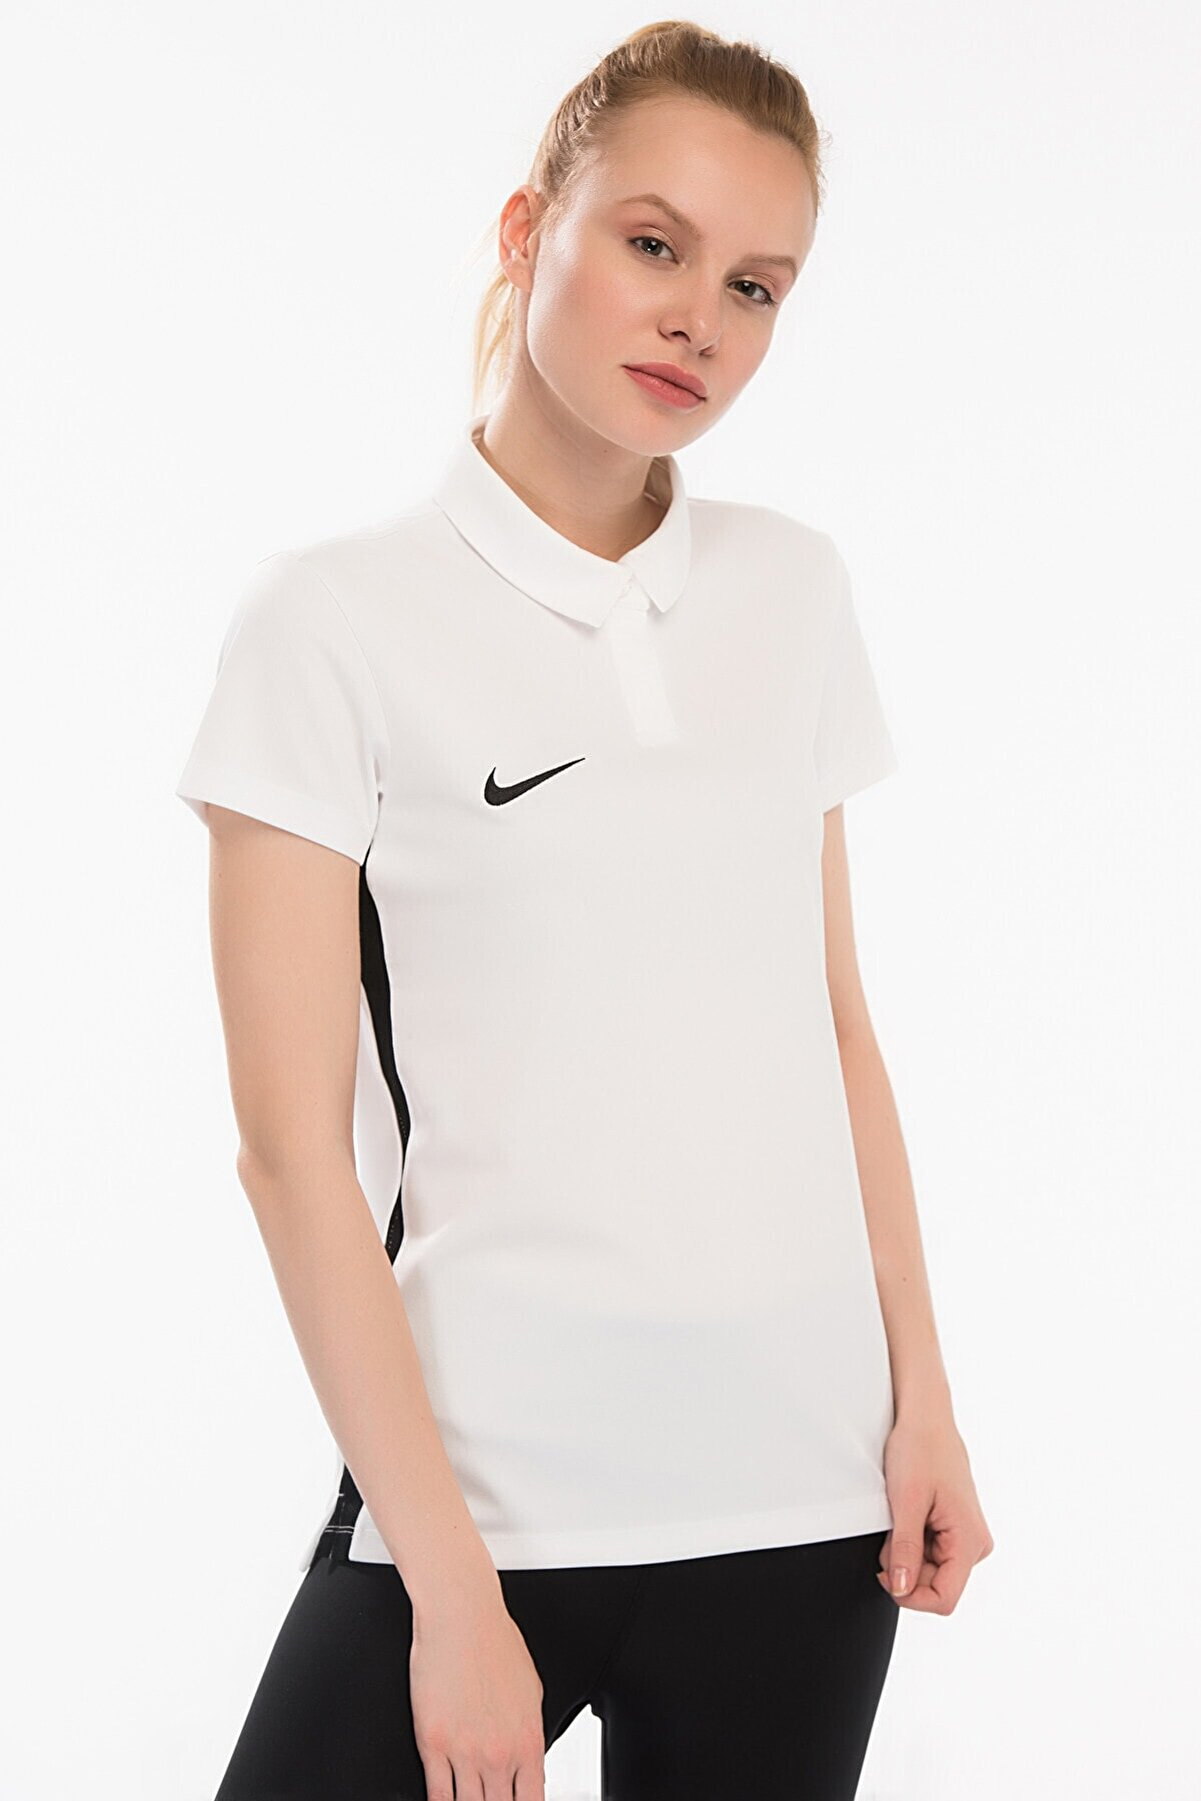 Nike 899986-100 Kadın Polo T-Shirt